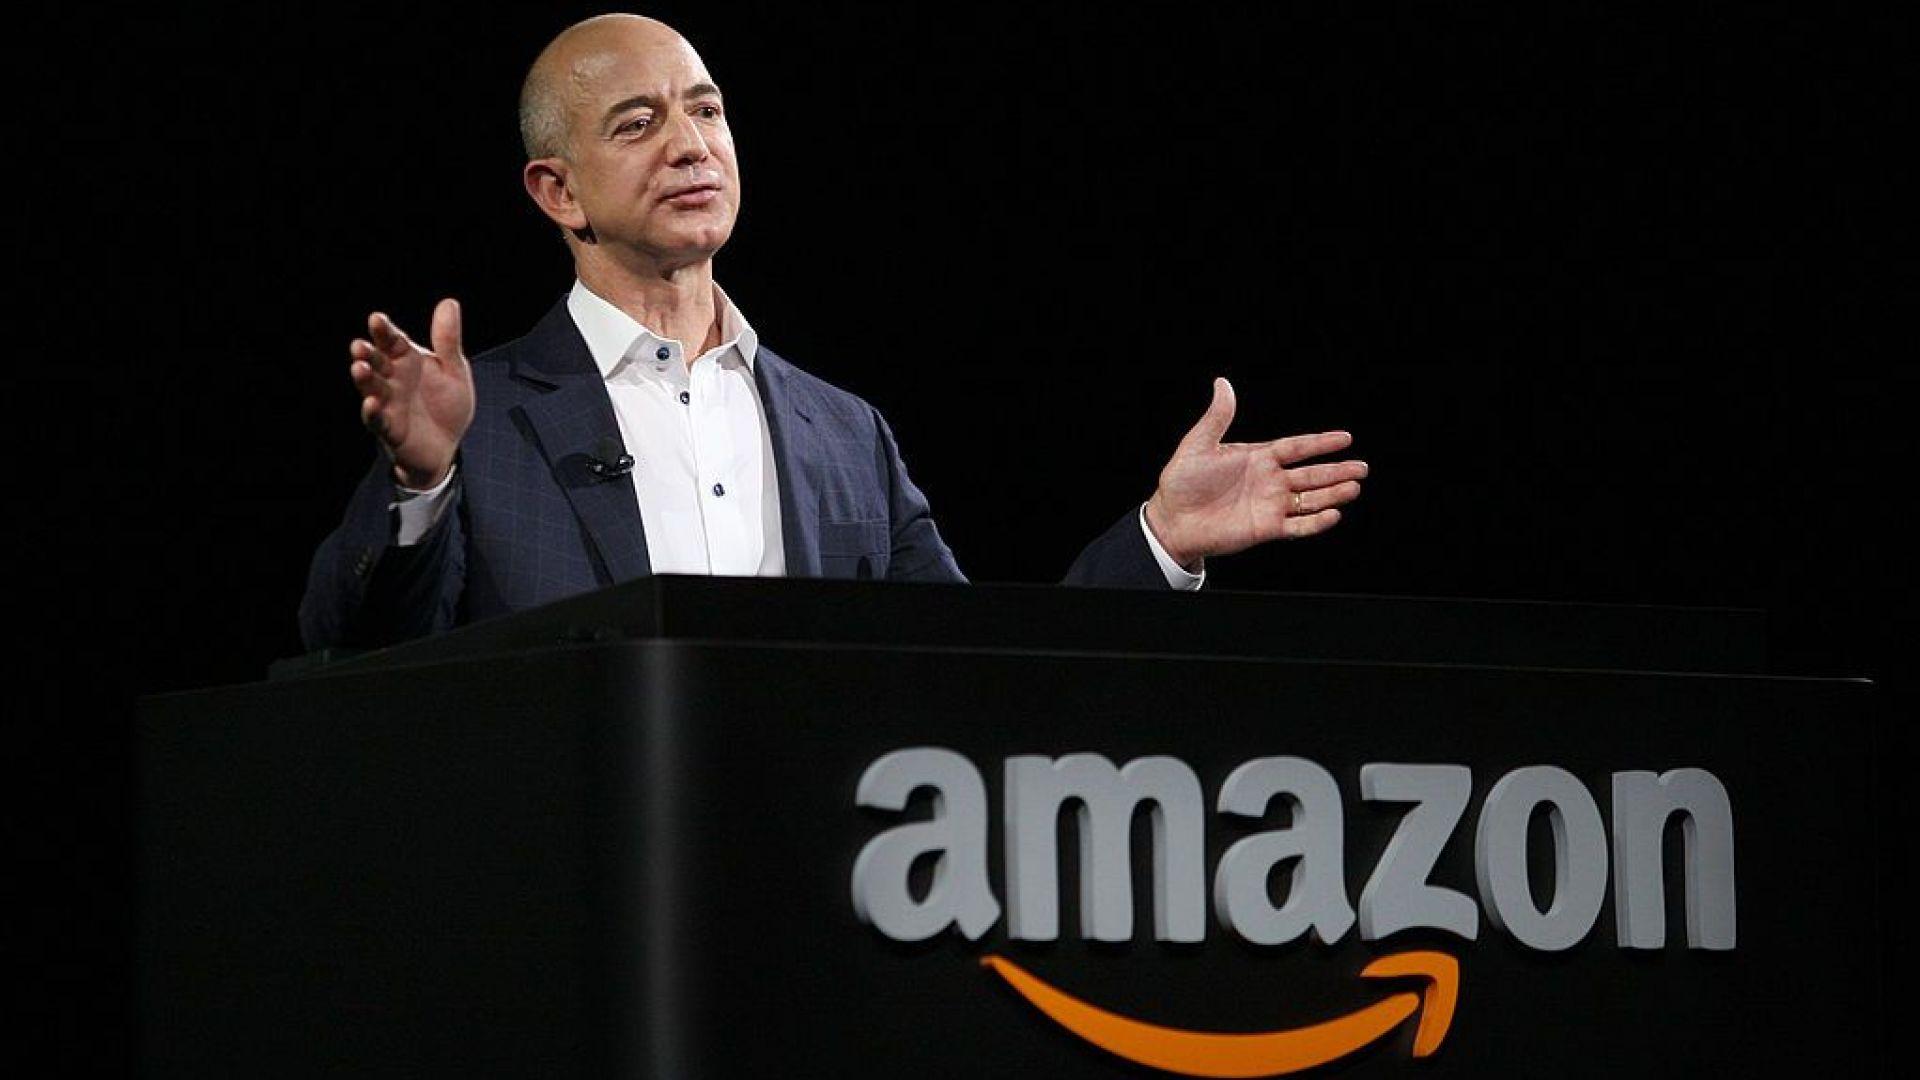 Джеф Безос напуска поста главен изпълнителен директор на Amazon